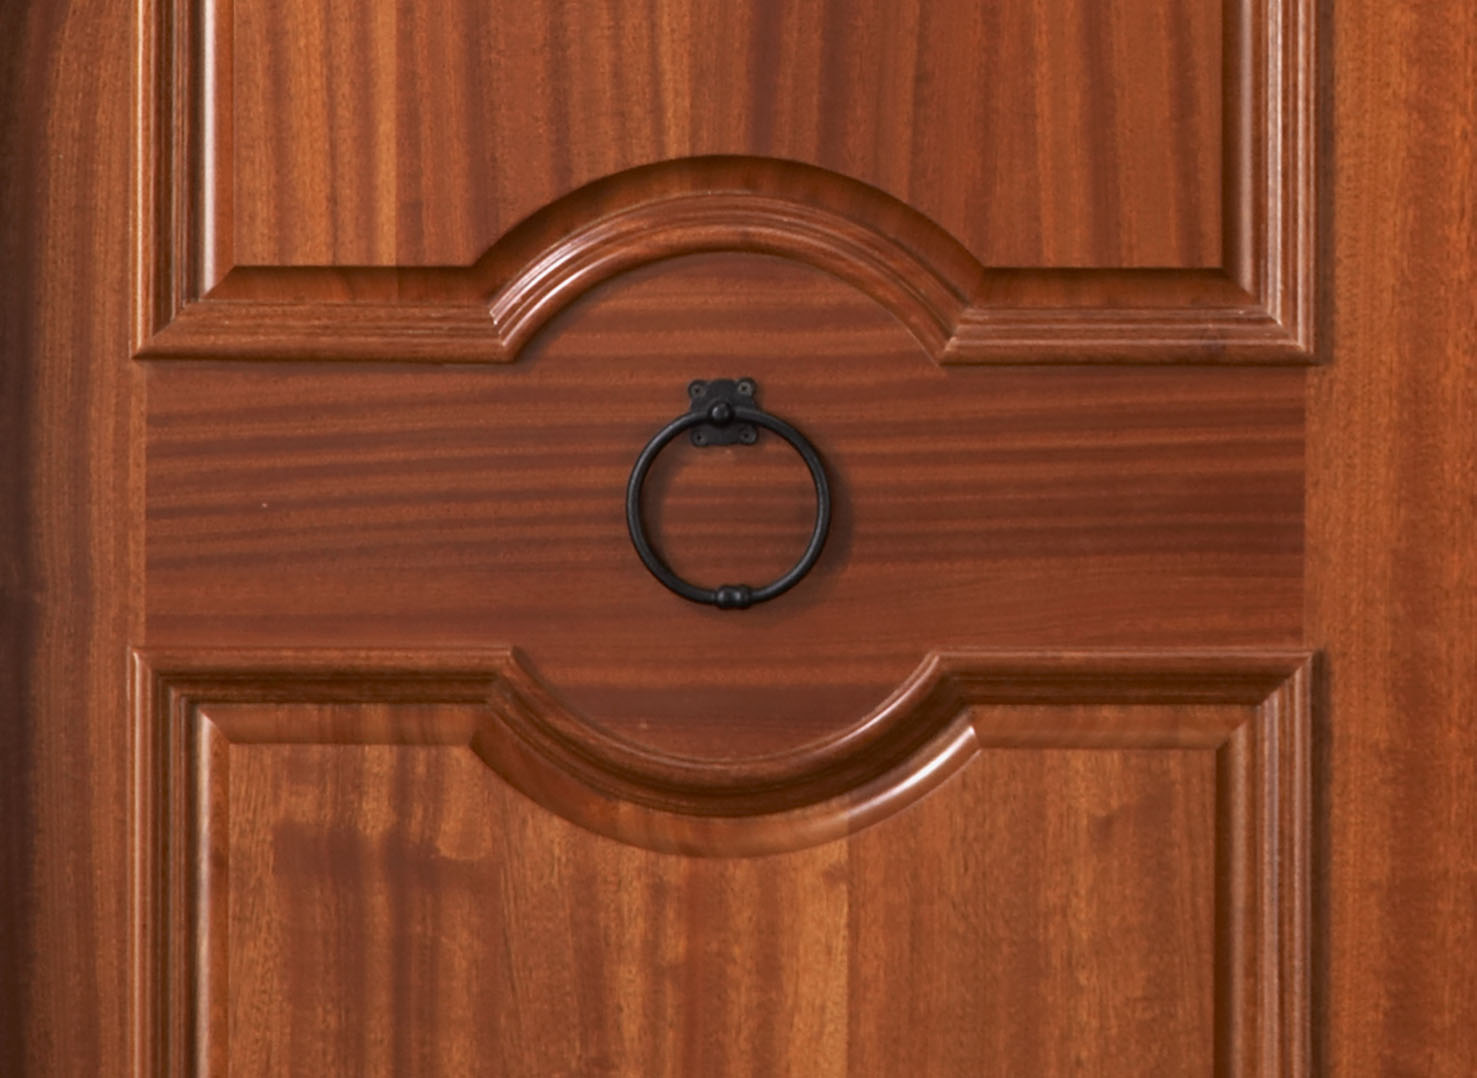 1078 #A44E27 Salzburg African Mahogany True Radius Top Double Door wallpaper Radius Top Entry Doors 38951477